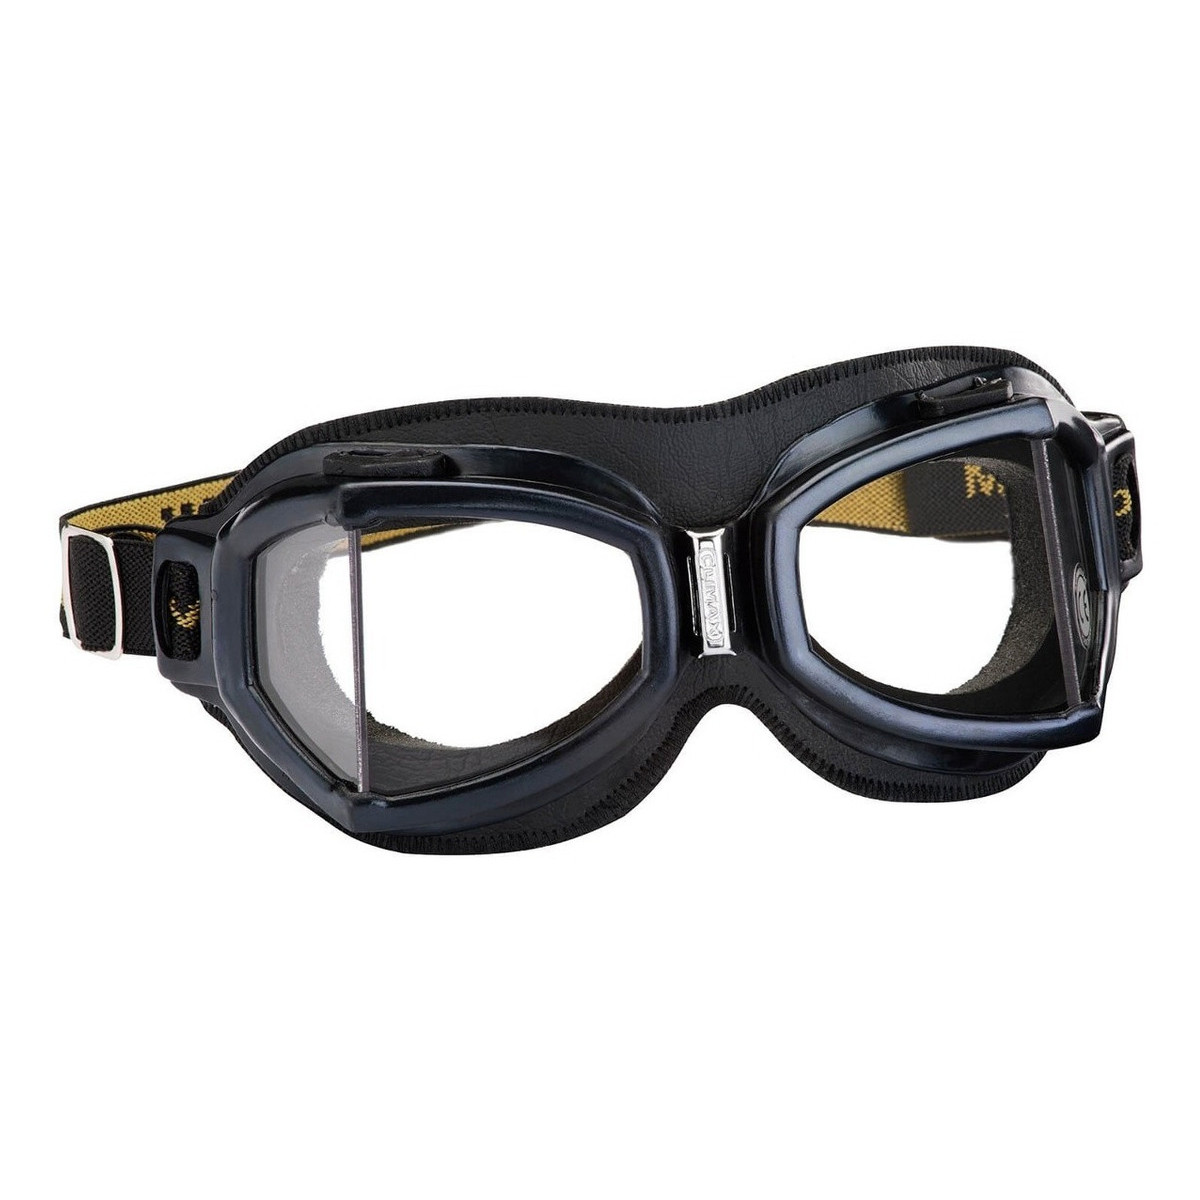 Antiparras Climax 520 Negro Oscuro Original